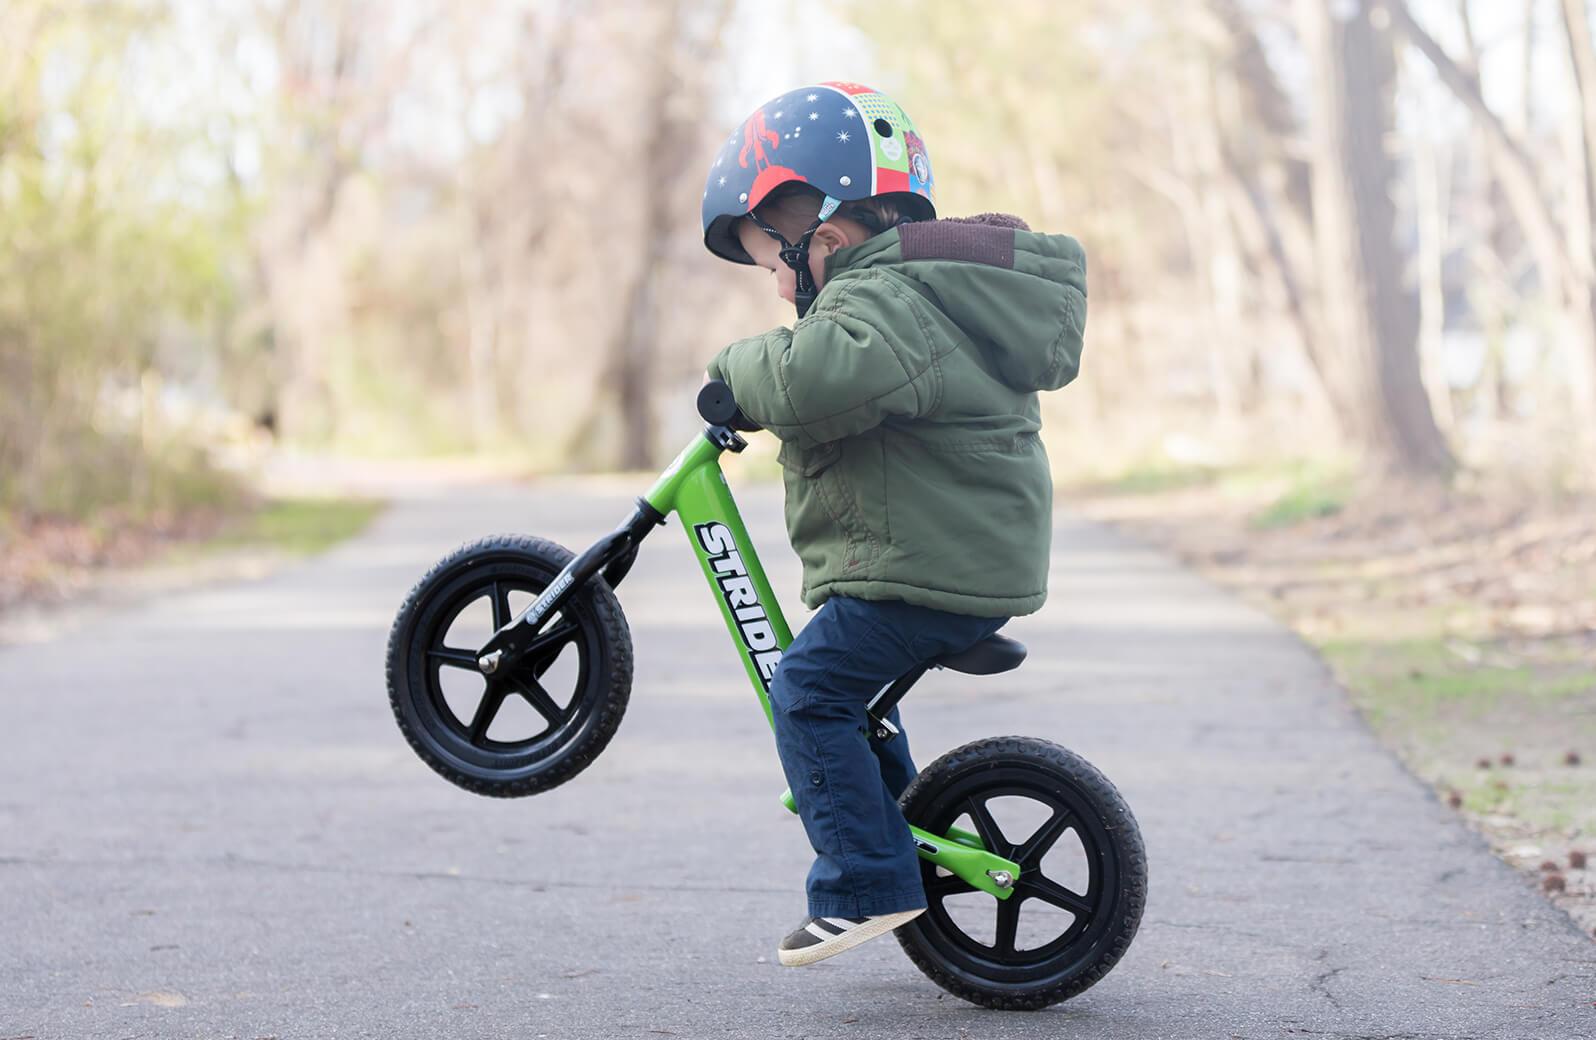 Roheline Strider jooksuratas poisiga